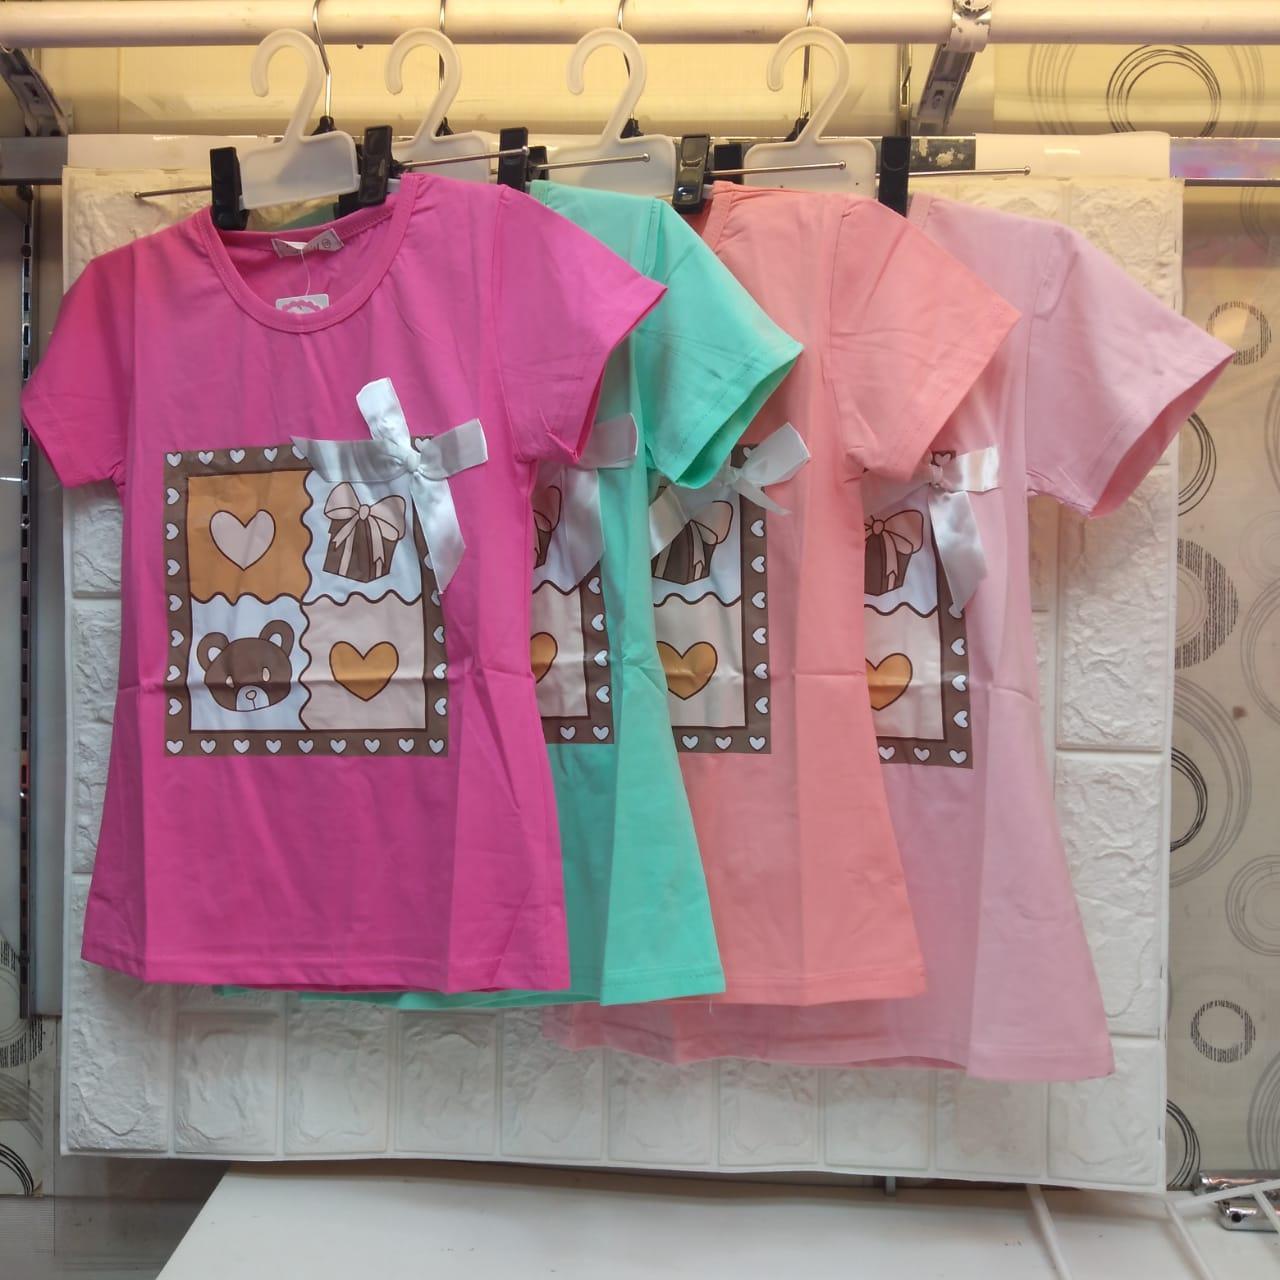 coco fashion kid / t-shirt anak perempuan / kaos anak  wisteria cat